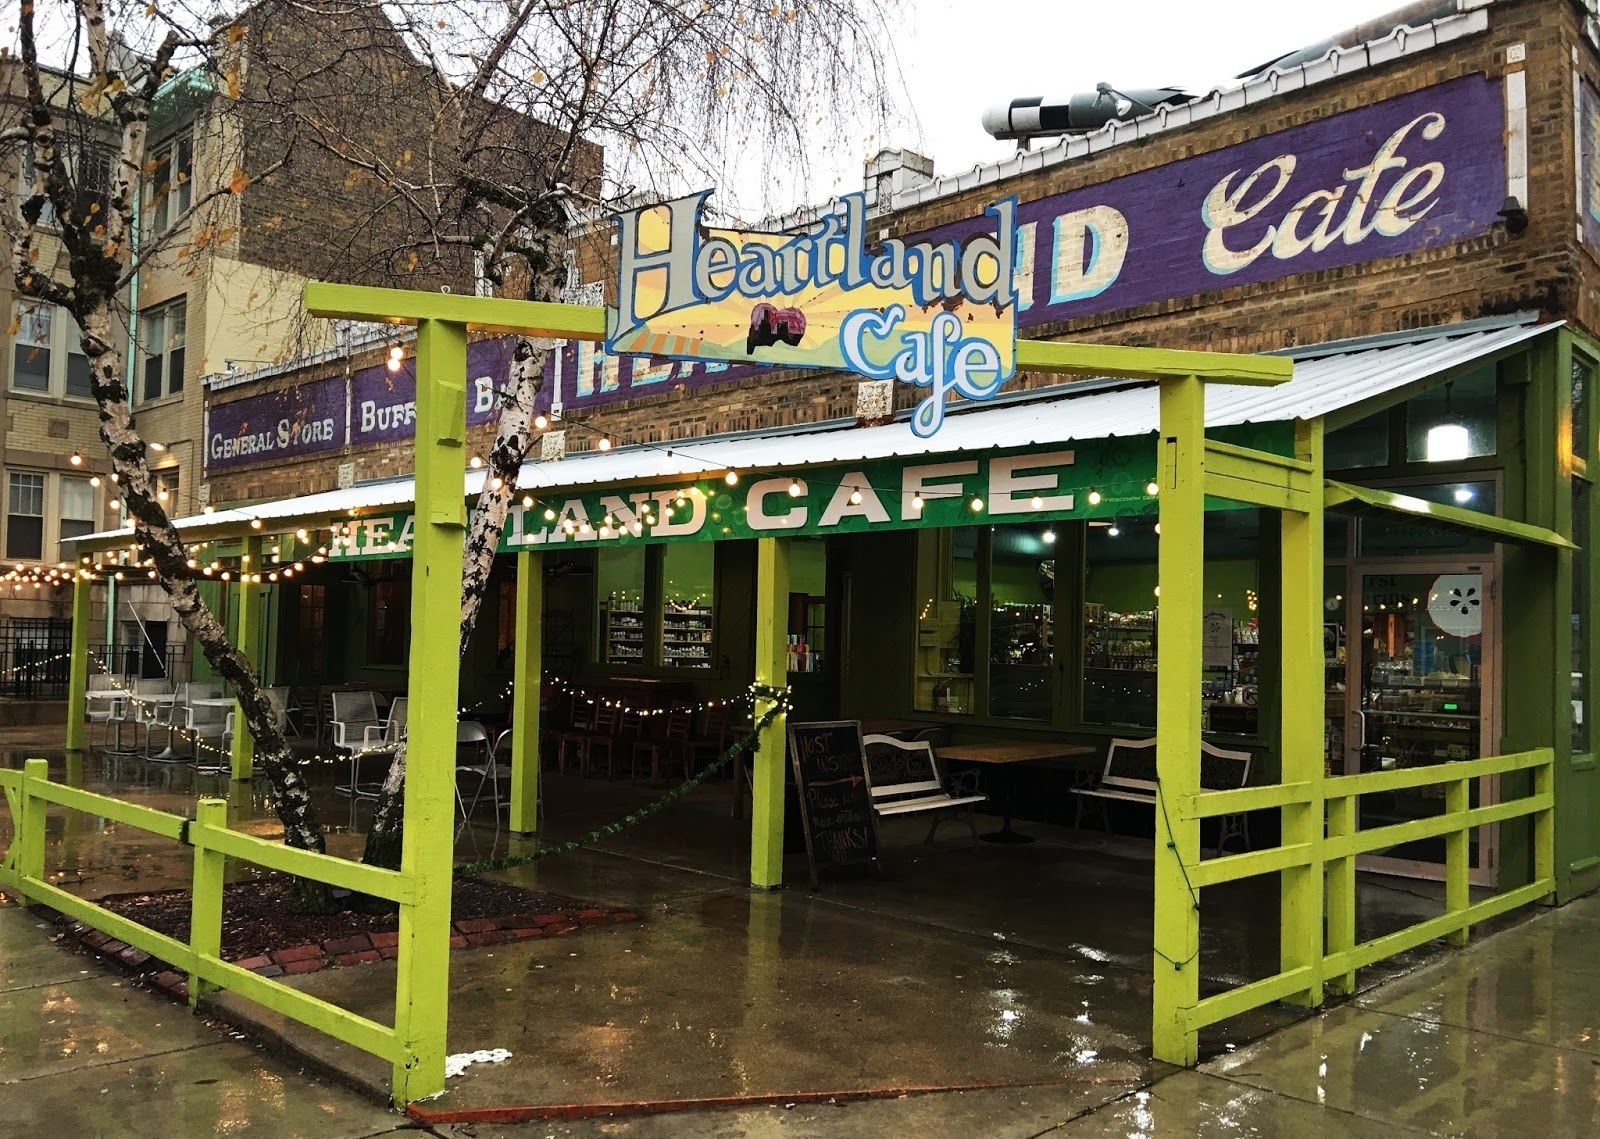 Heartland Cafe, Rogers Park, Chicago Chicago food, Cafe